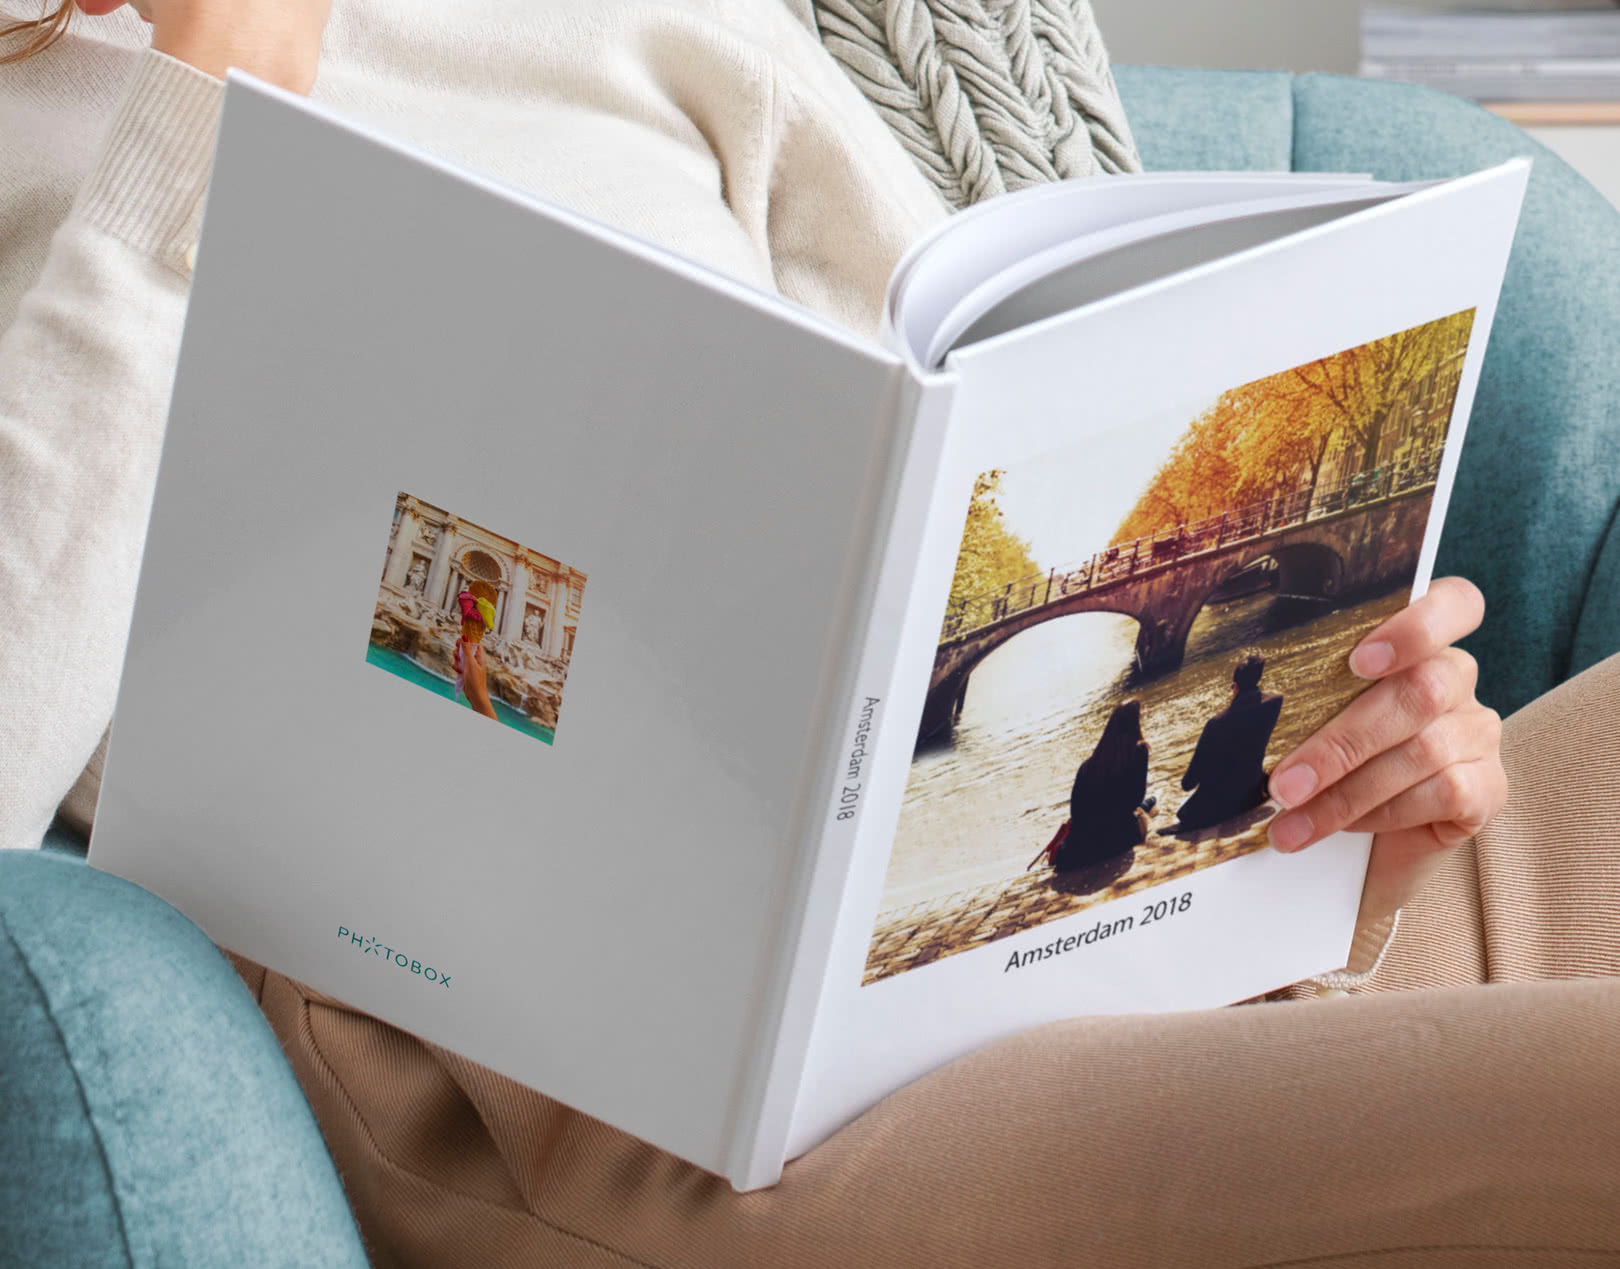 Easy Create Photo Books